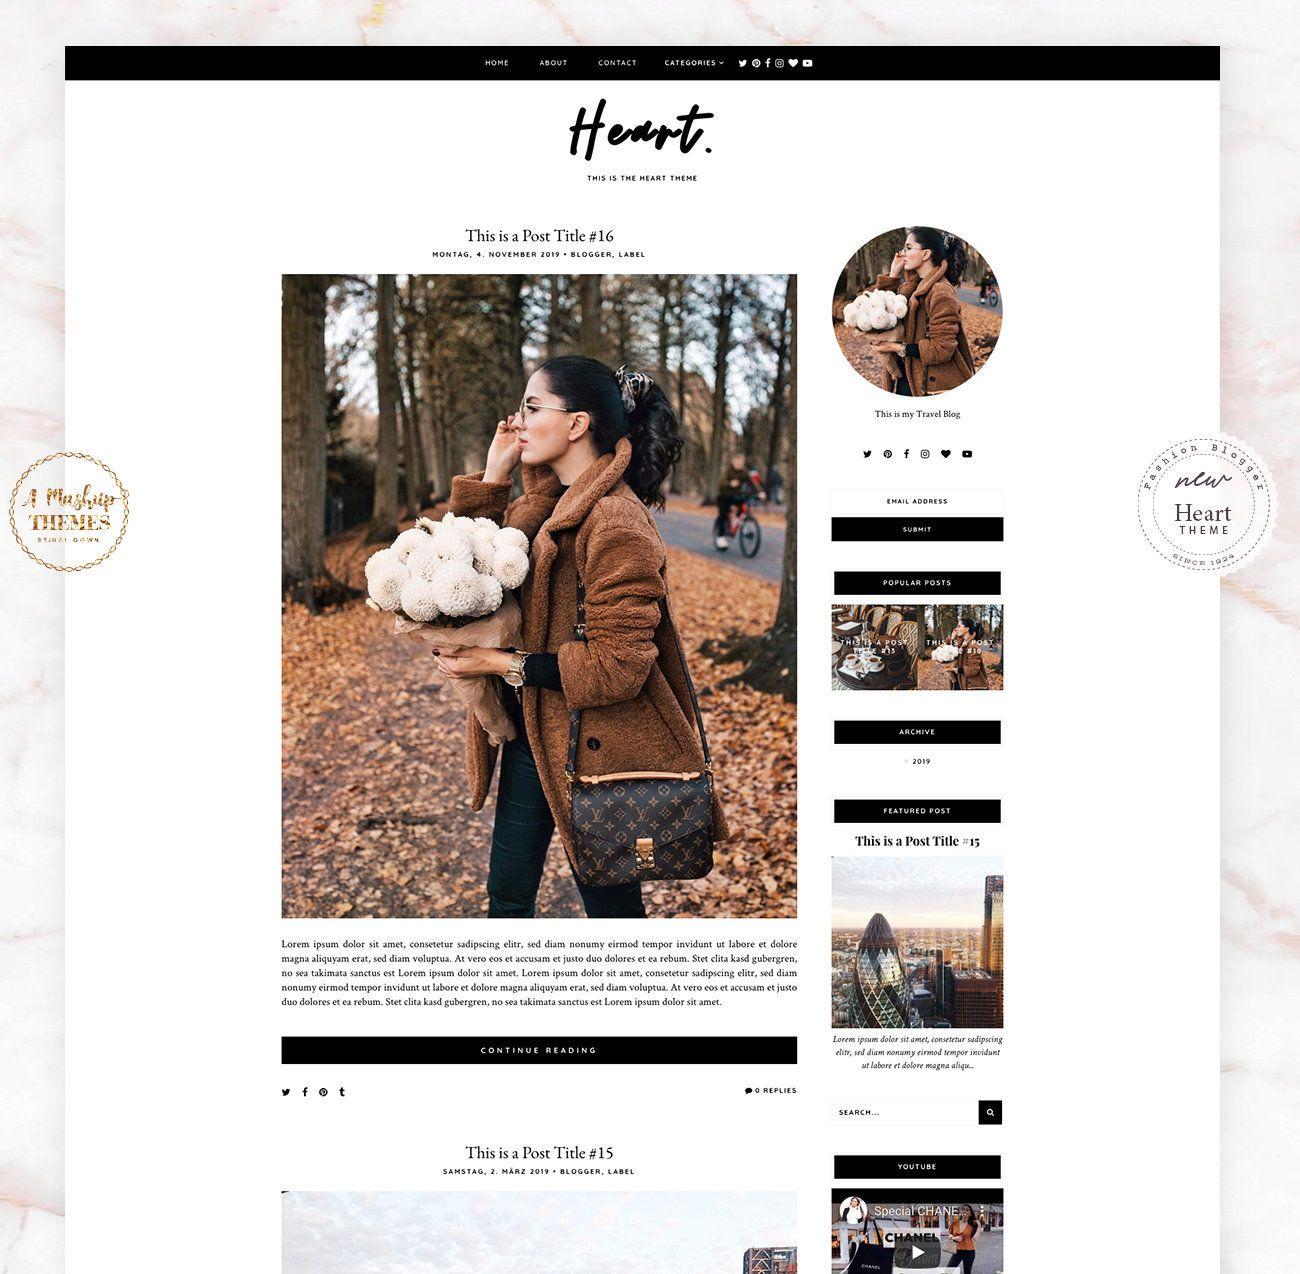 Herz Blogger Vorlage Responsive Design Custom Blogger Design Responsive Blogger Vorlage Blogger Thema Blogspot Vorlage Responsive Design Mobile Web Design Social Media Icons